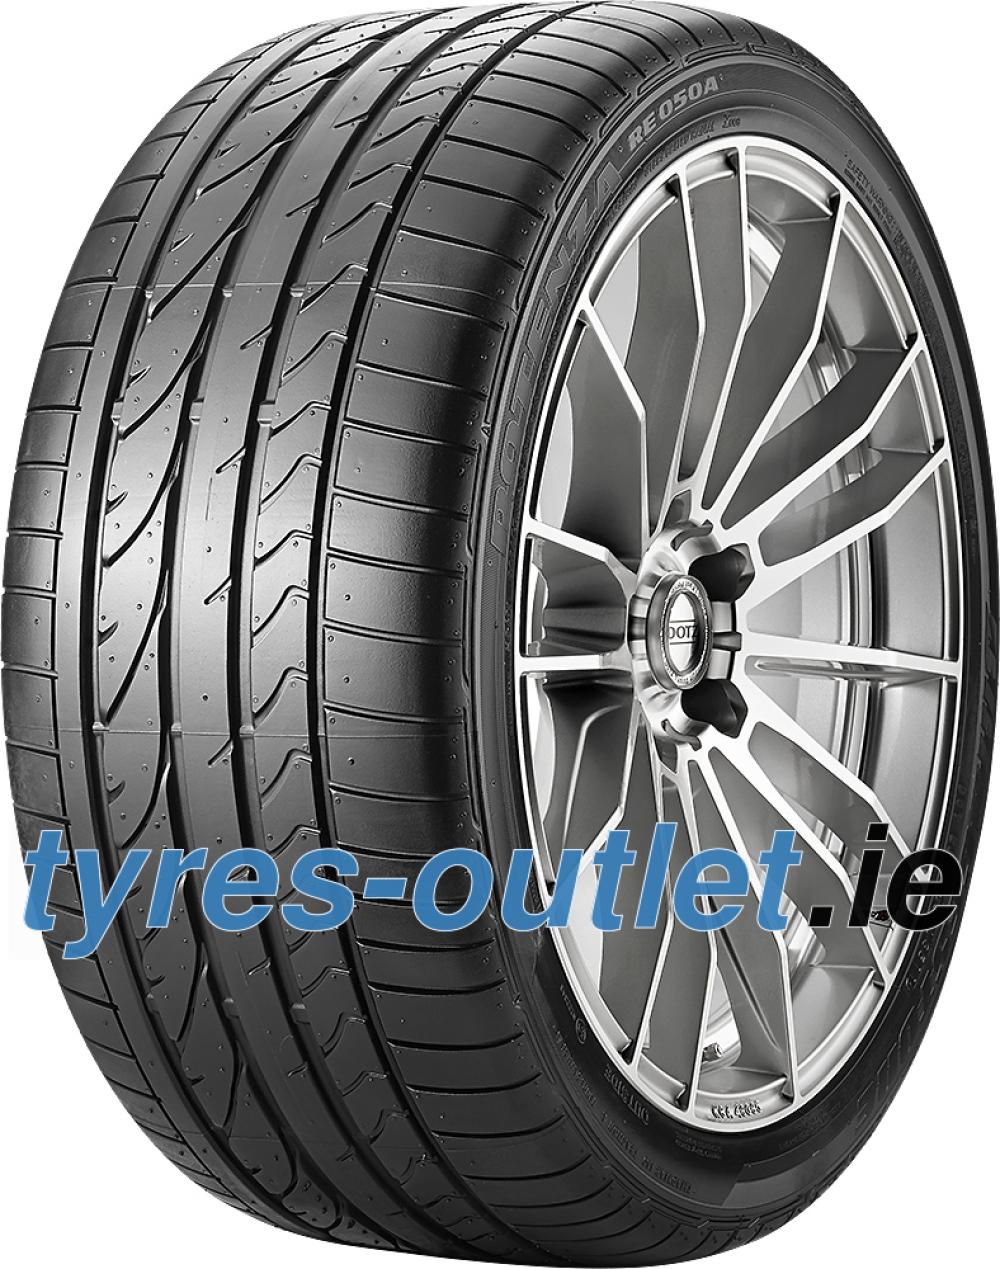 Bridgestone Potenza RE 050 A RFT ( 225/40 R18 92W XL runflat, with rim protection (MFS) )